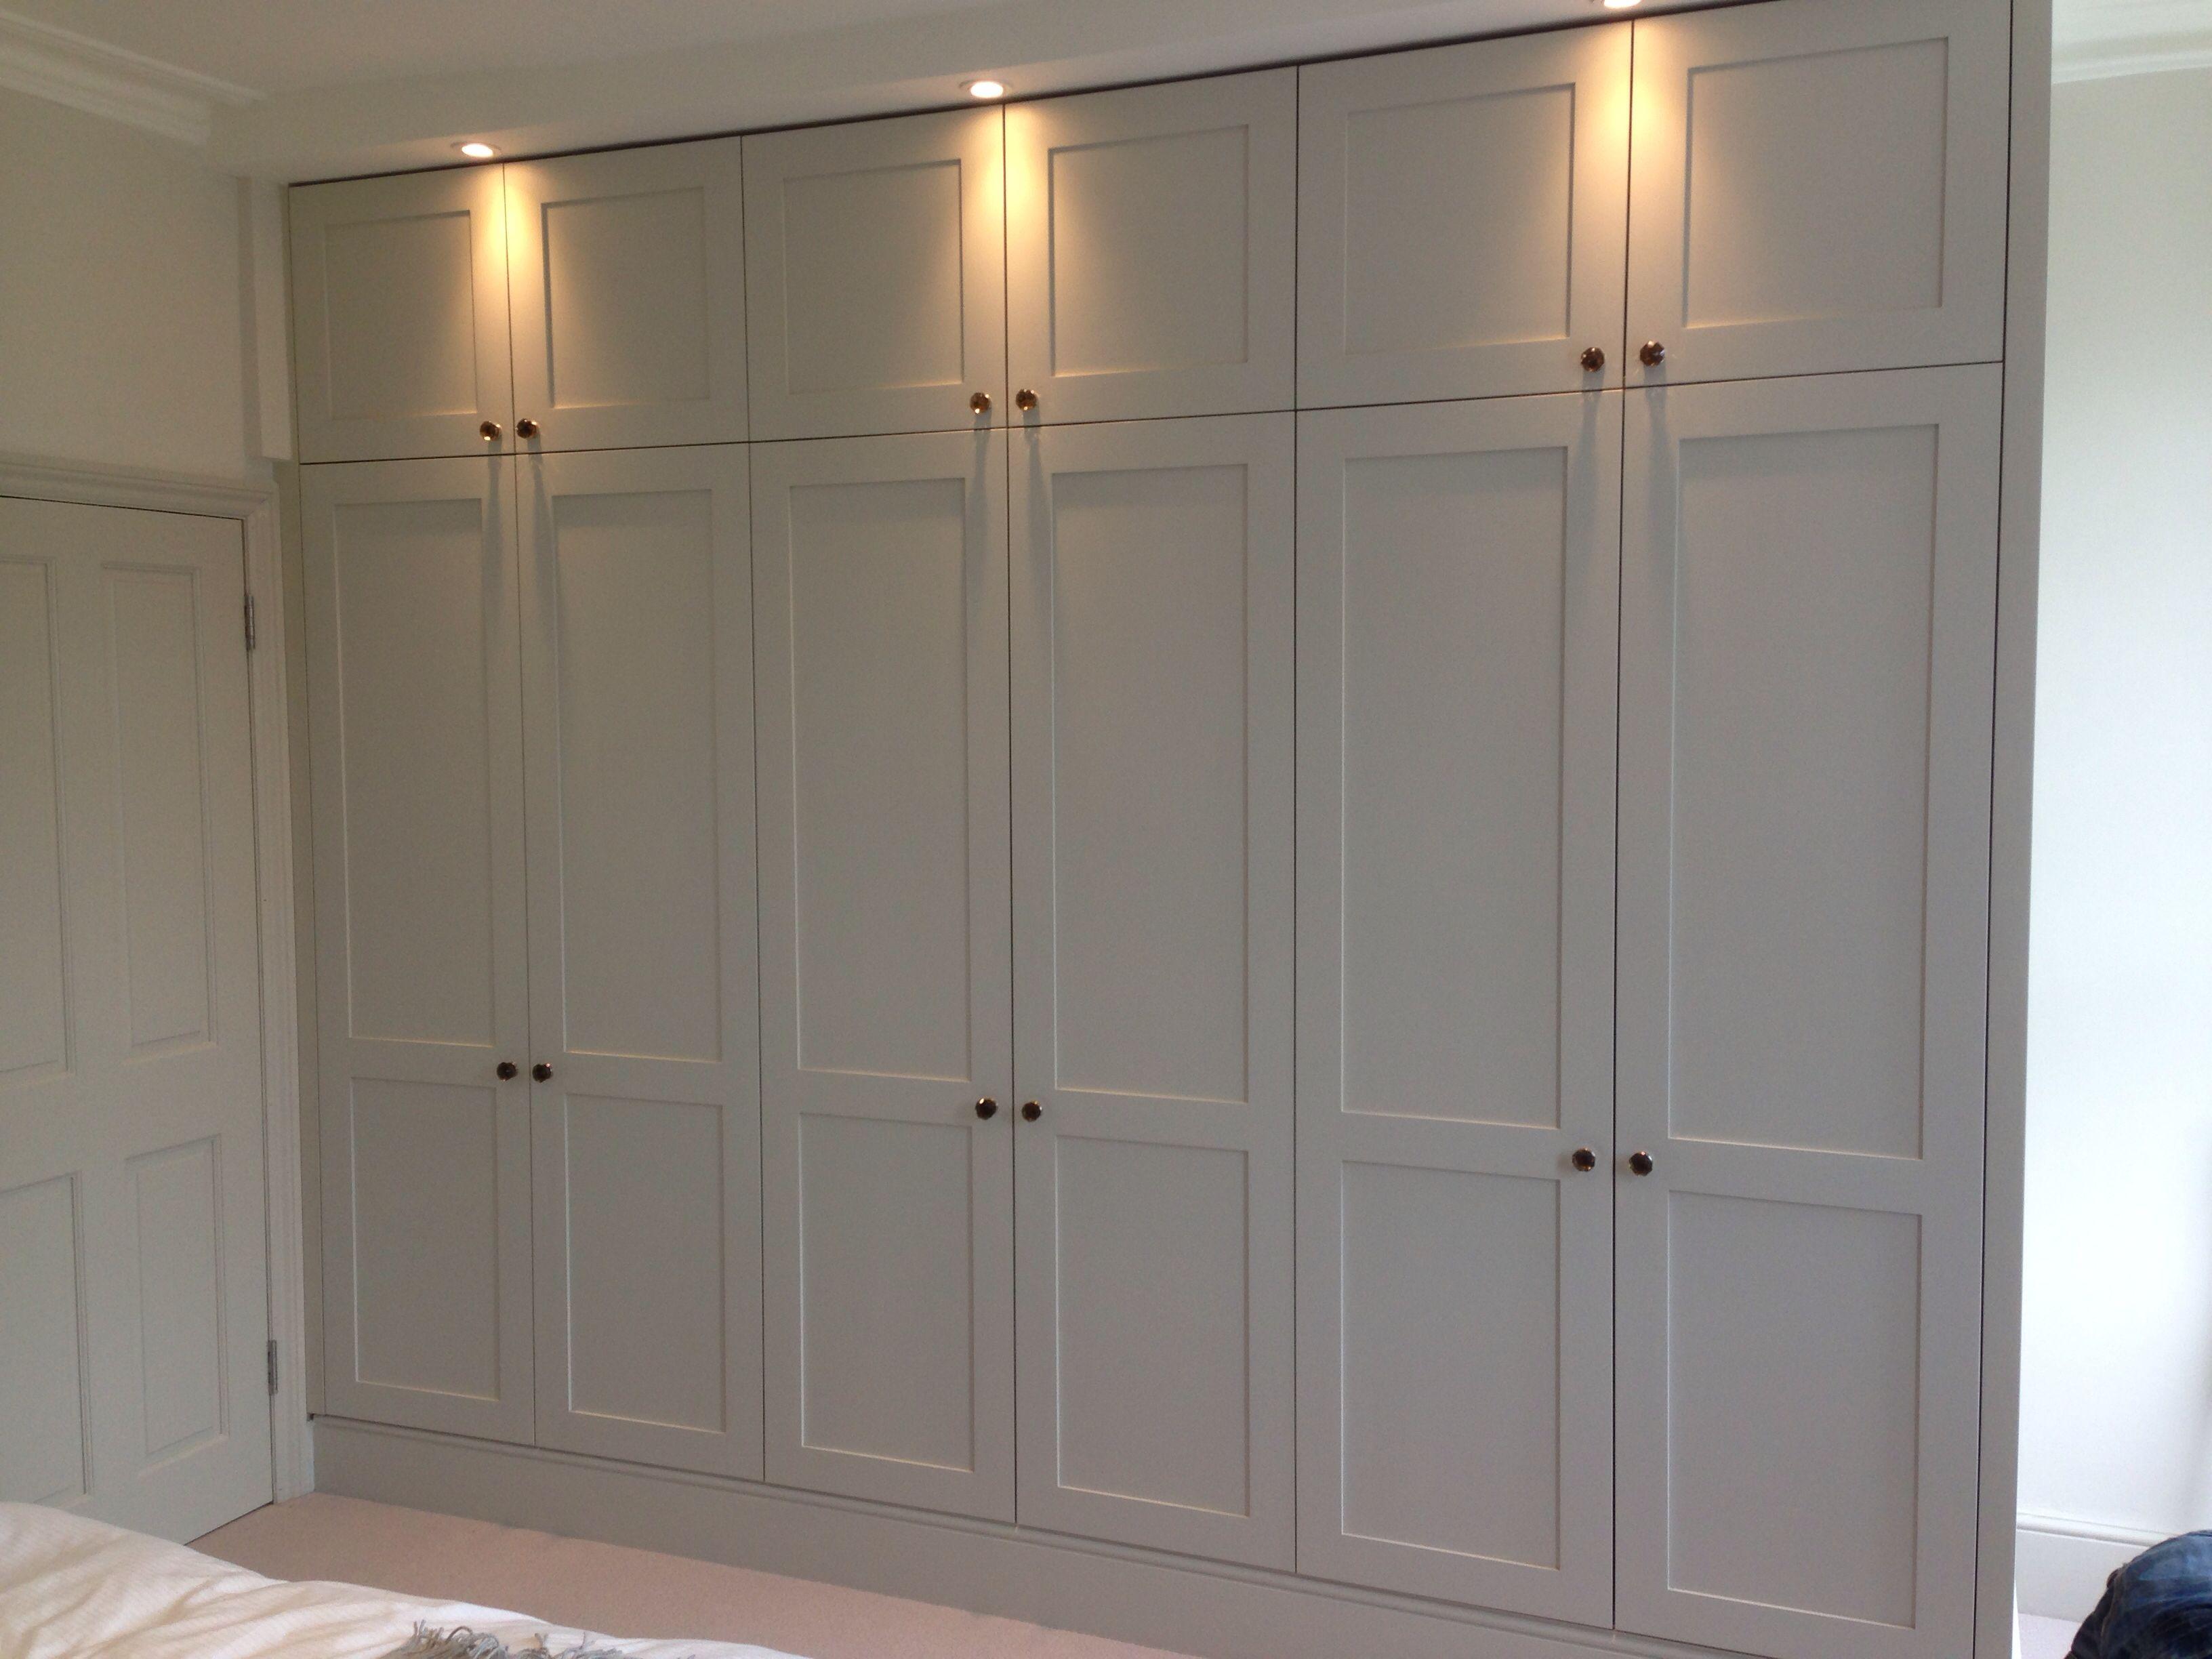 Bespoke Fitted Wardrobe By Fine Balance Carpentry